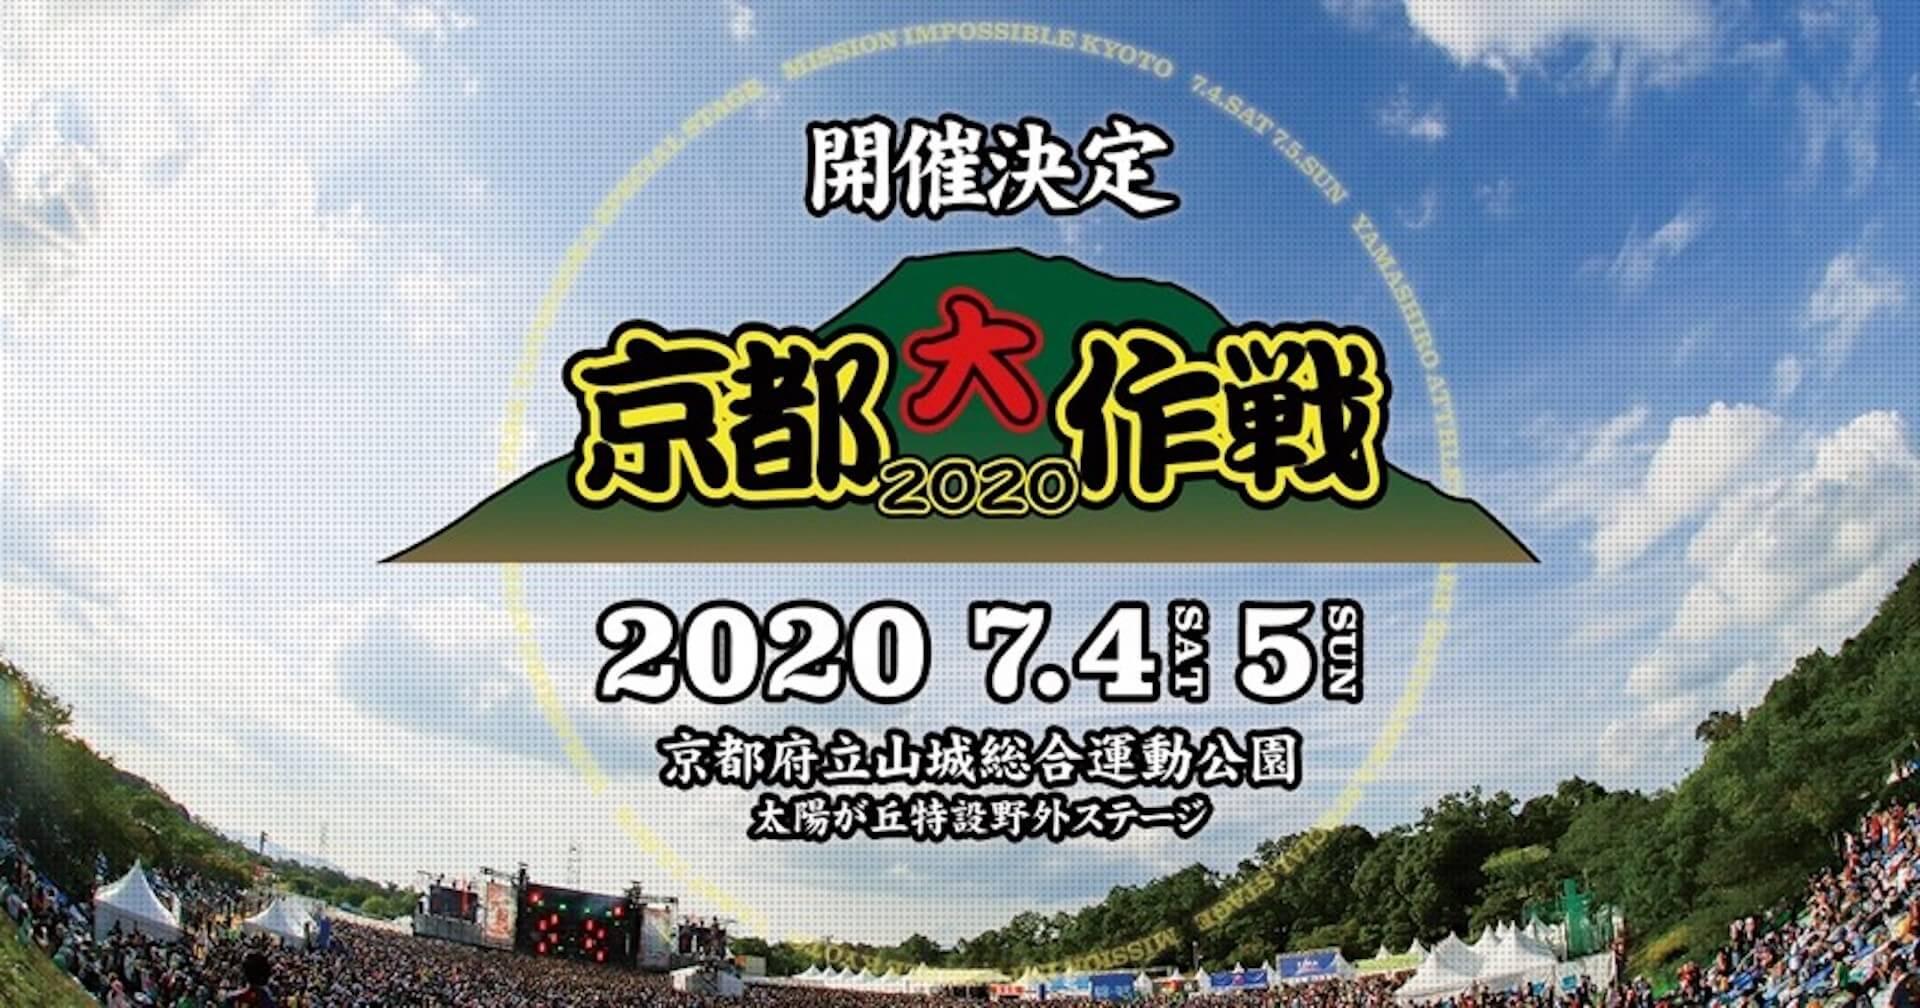 10-FEET<京都大作戦2020>開催を発表!ファッションブランド・ニューエラとのコラボアイテムが本日より期間限定発売 music191224_kyotodaisakusen_1